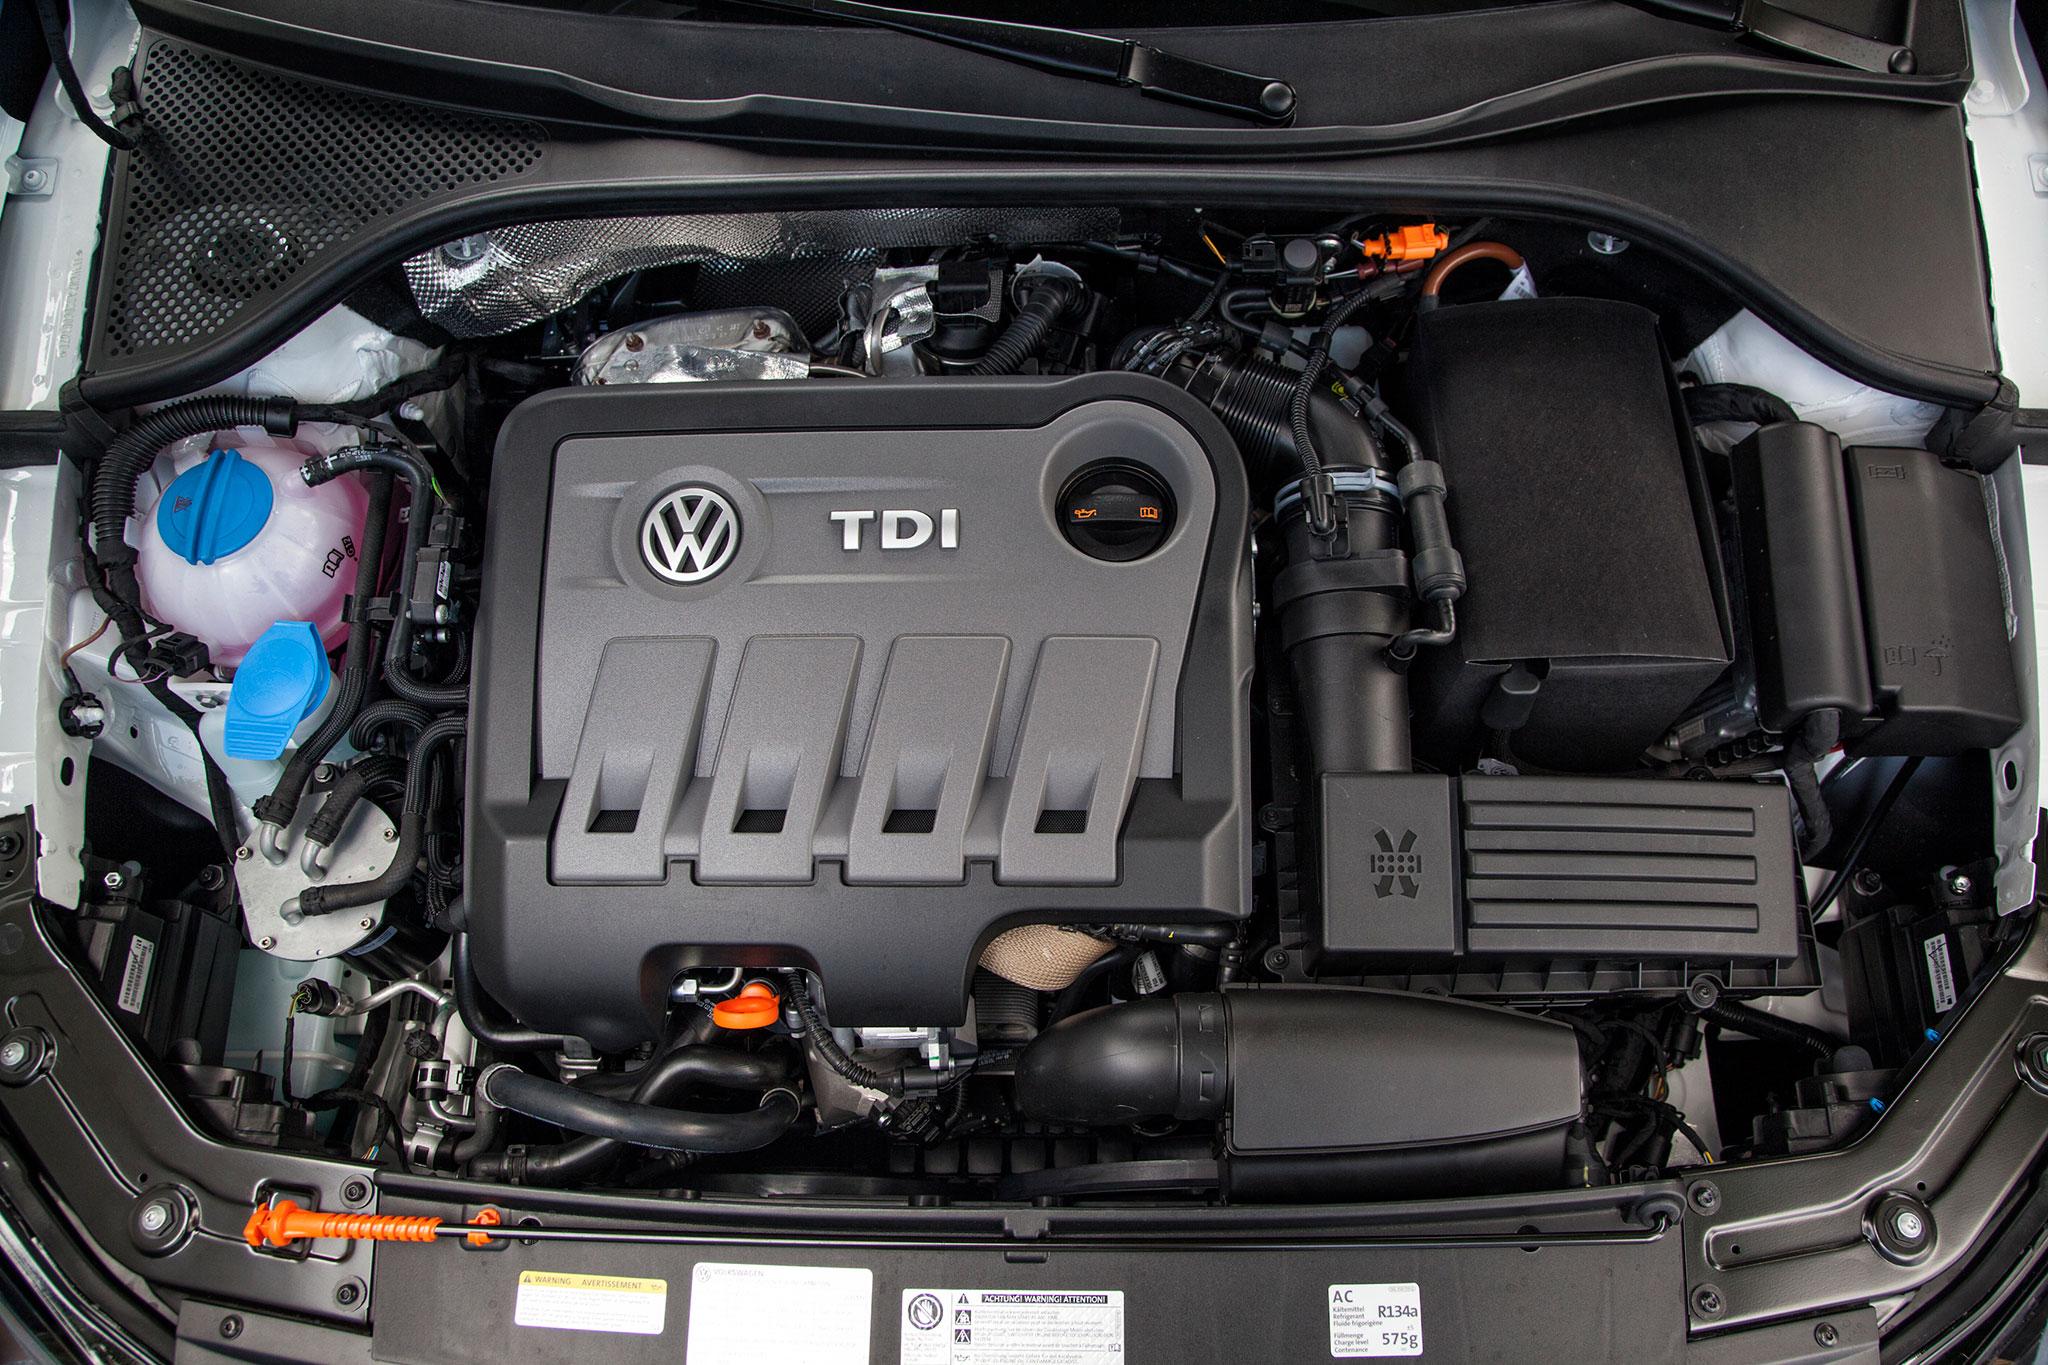 Volkswagen Confirms New Diesel For 2015 Models Automobile Magazine 2011 Gt500 Fuse Box Joseph Capparella